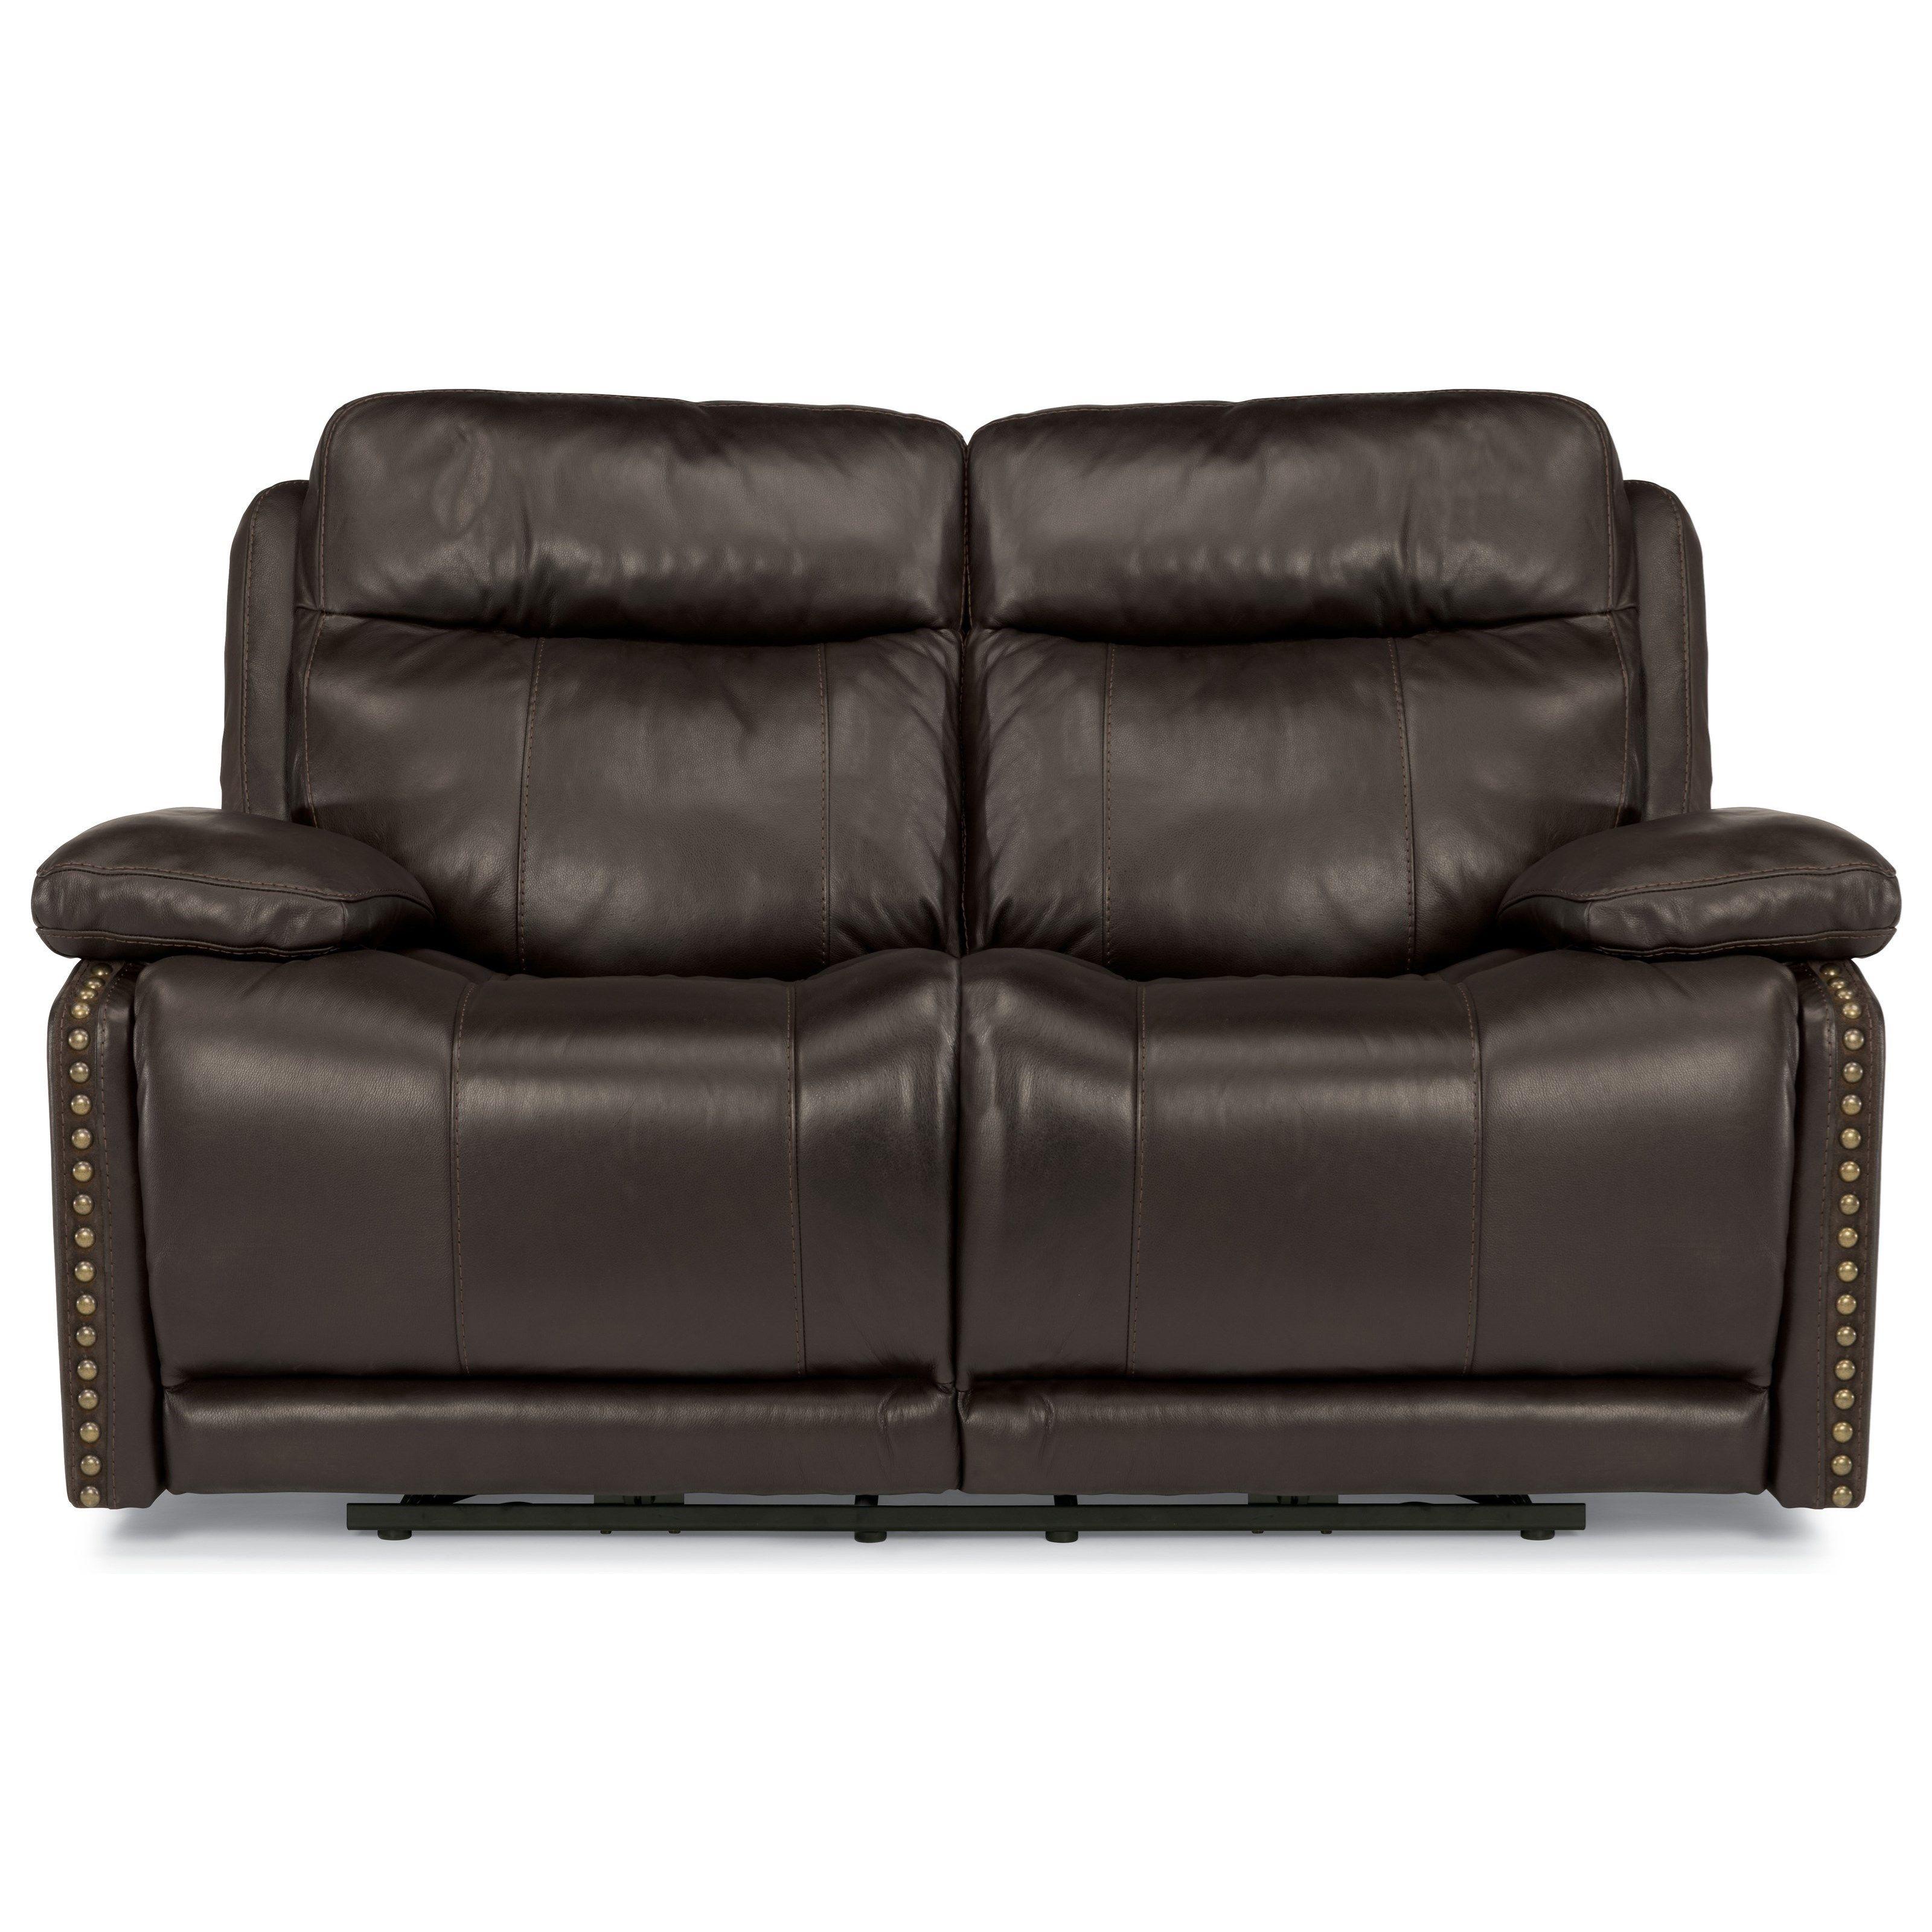 Excellent Latitudes Russell Power Reclining Love Seat By Flexsteel Machost Co Dining Chair Design Ideas Machostcouk